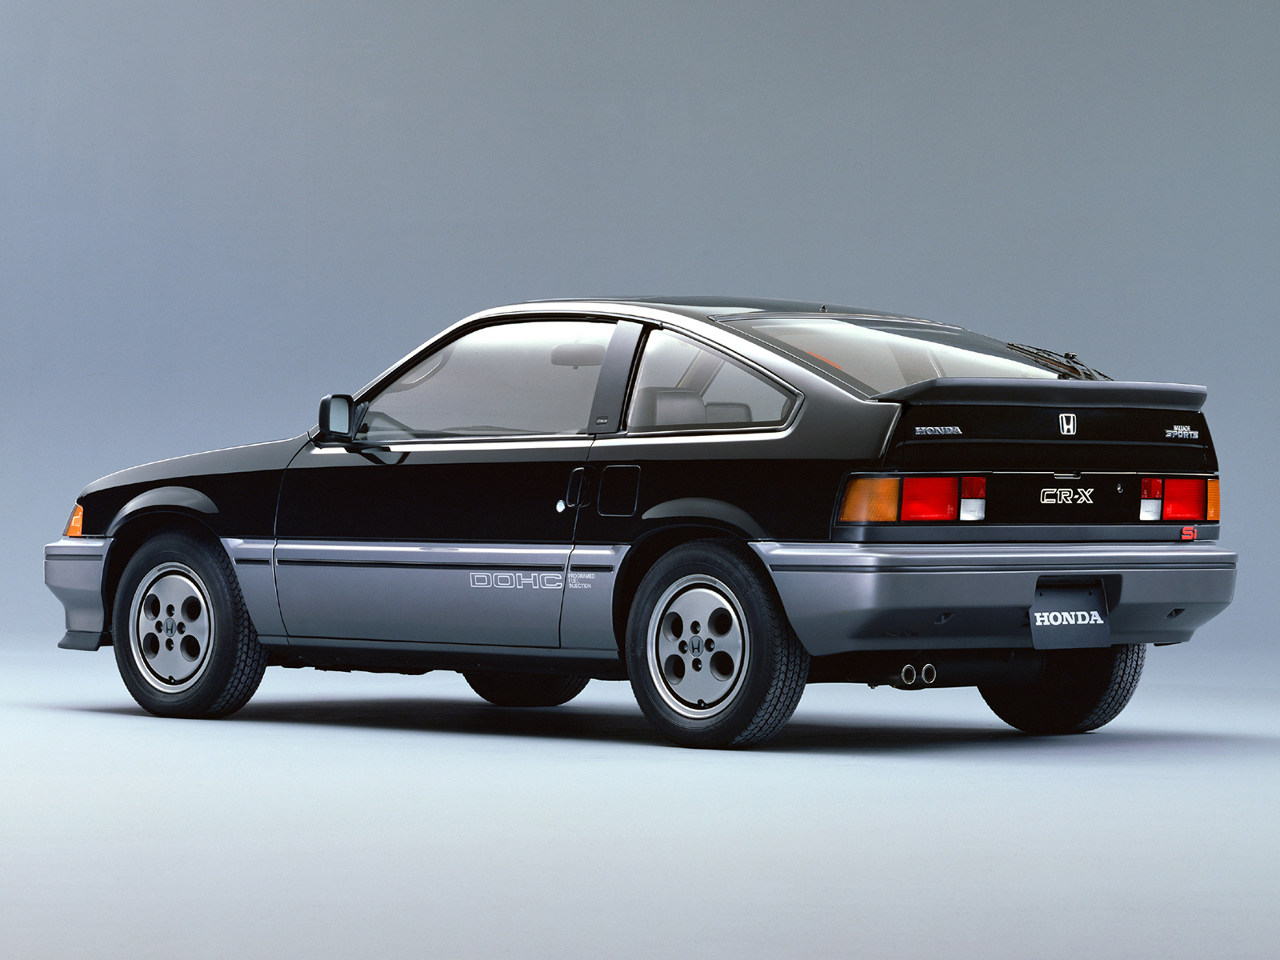 [Image: Honda%2BBallad%2BSports%2BCR-X%2BSi%2B83...p%2529.jpg]